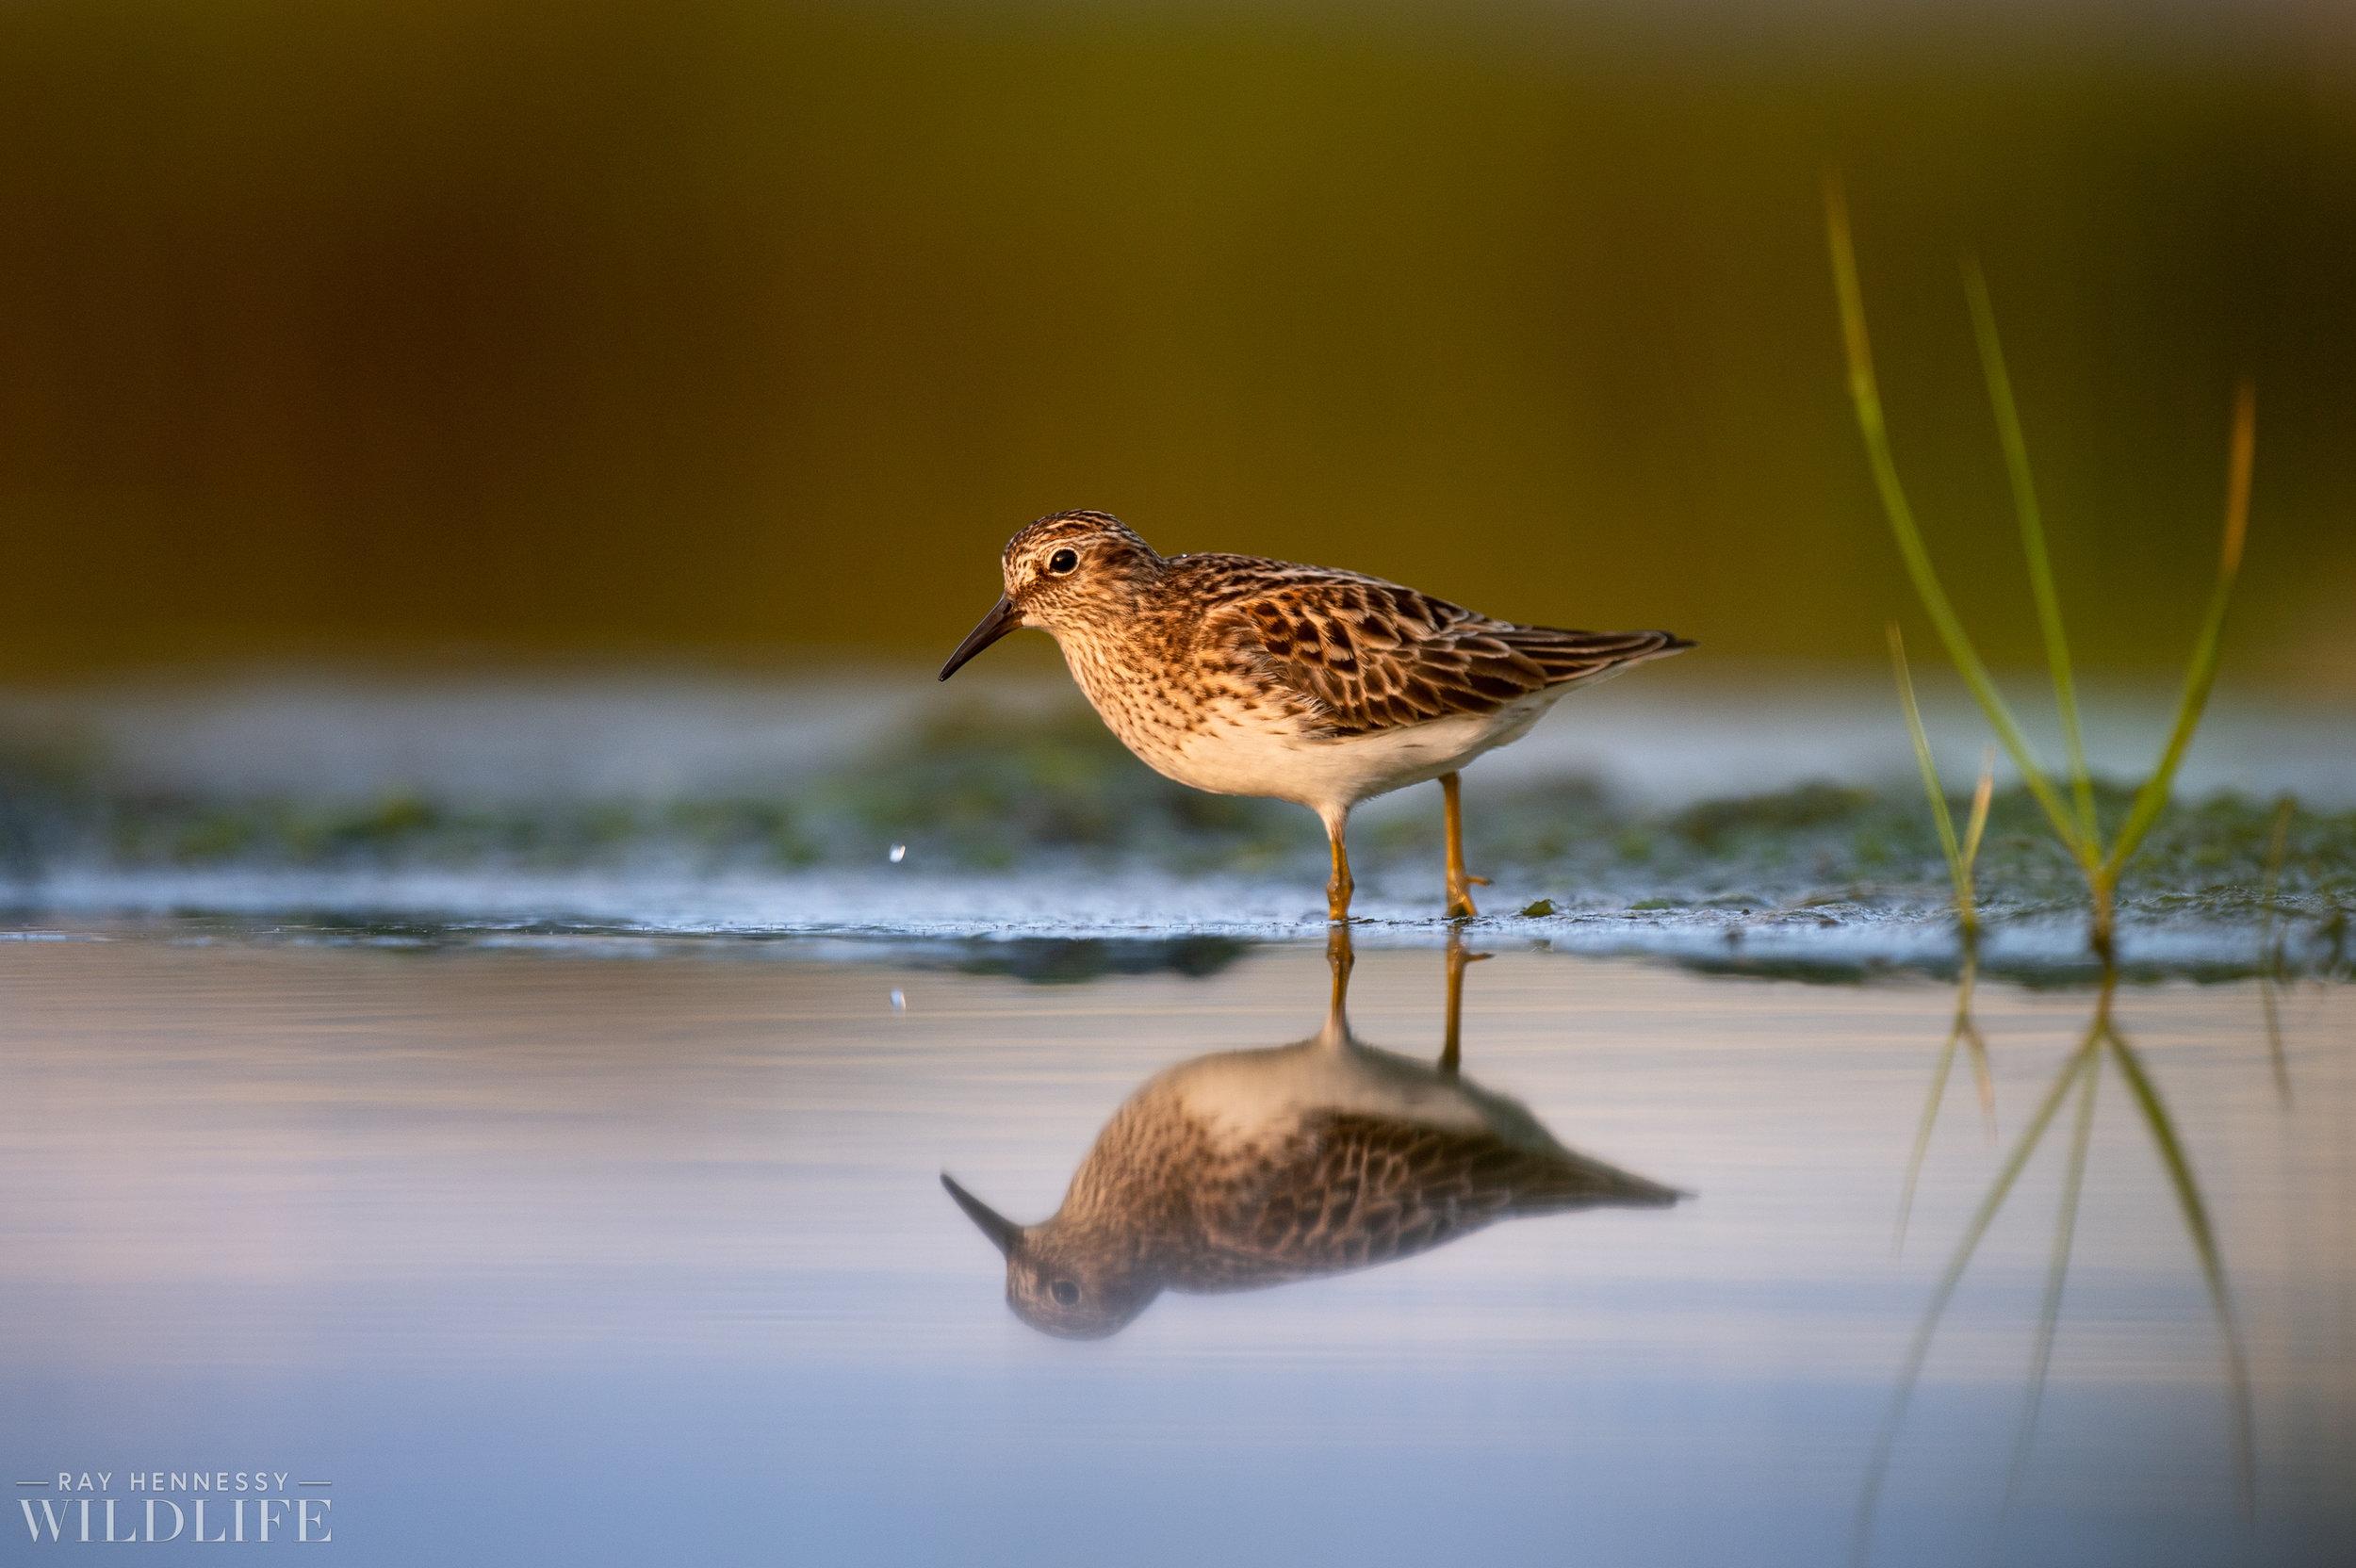 004_shorebirds-prothonotary-warbler.jpg